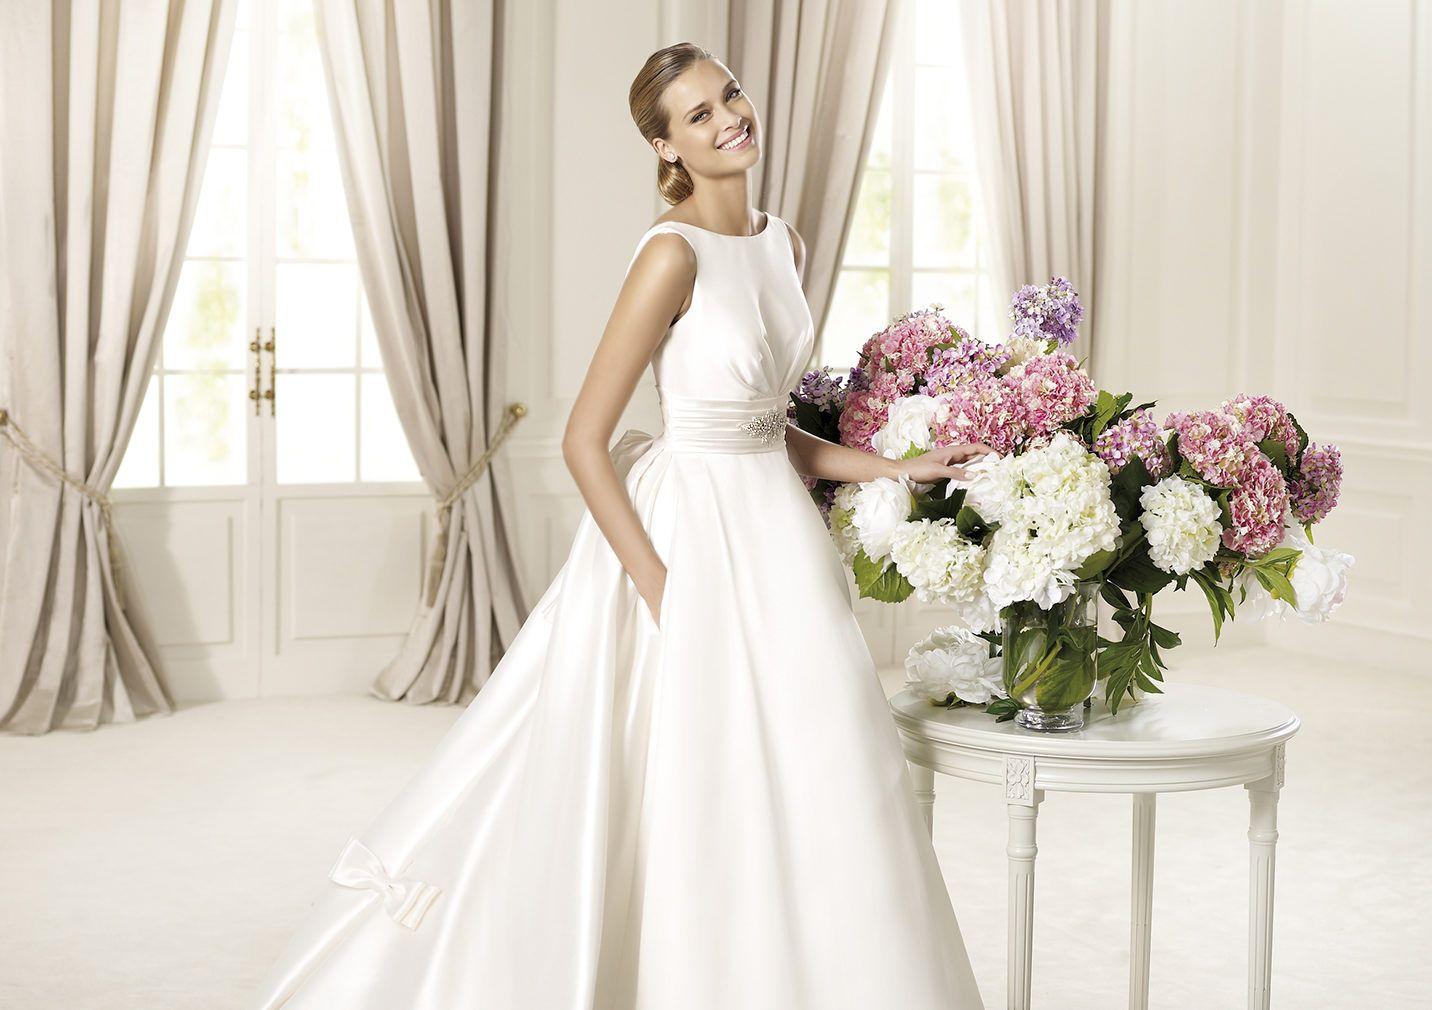 Pronovias Presents The Dalila Wedding Dress, Costura 2014